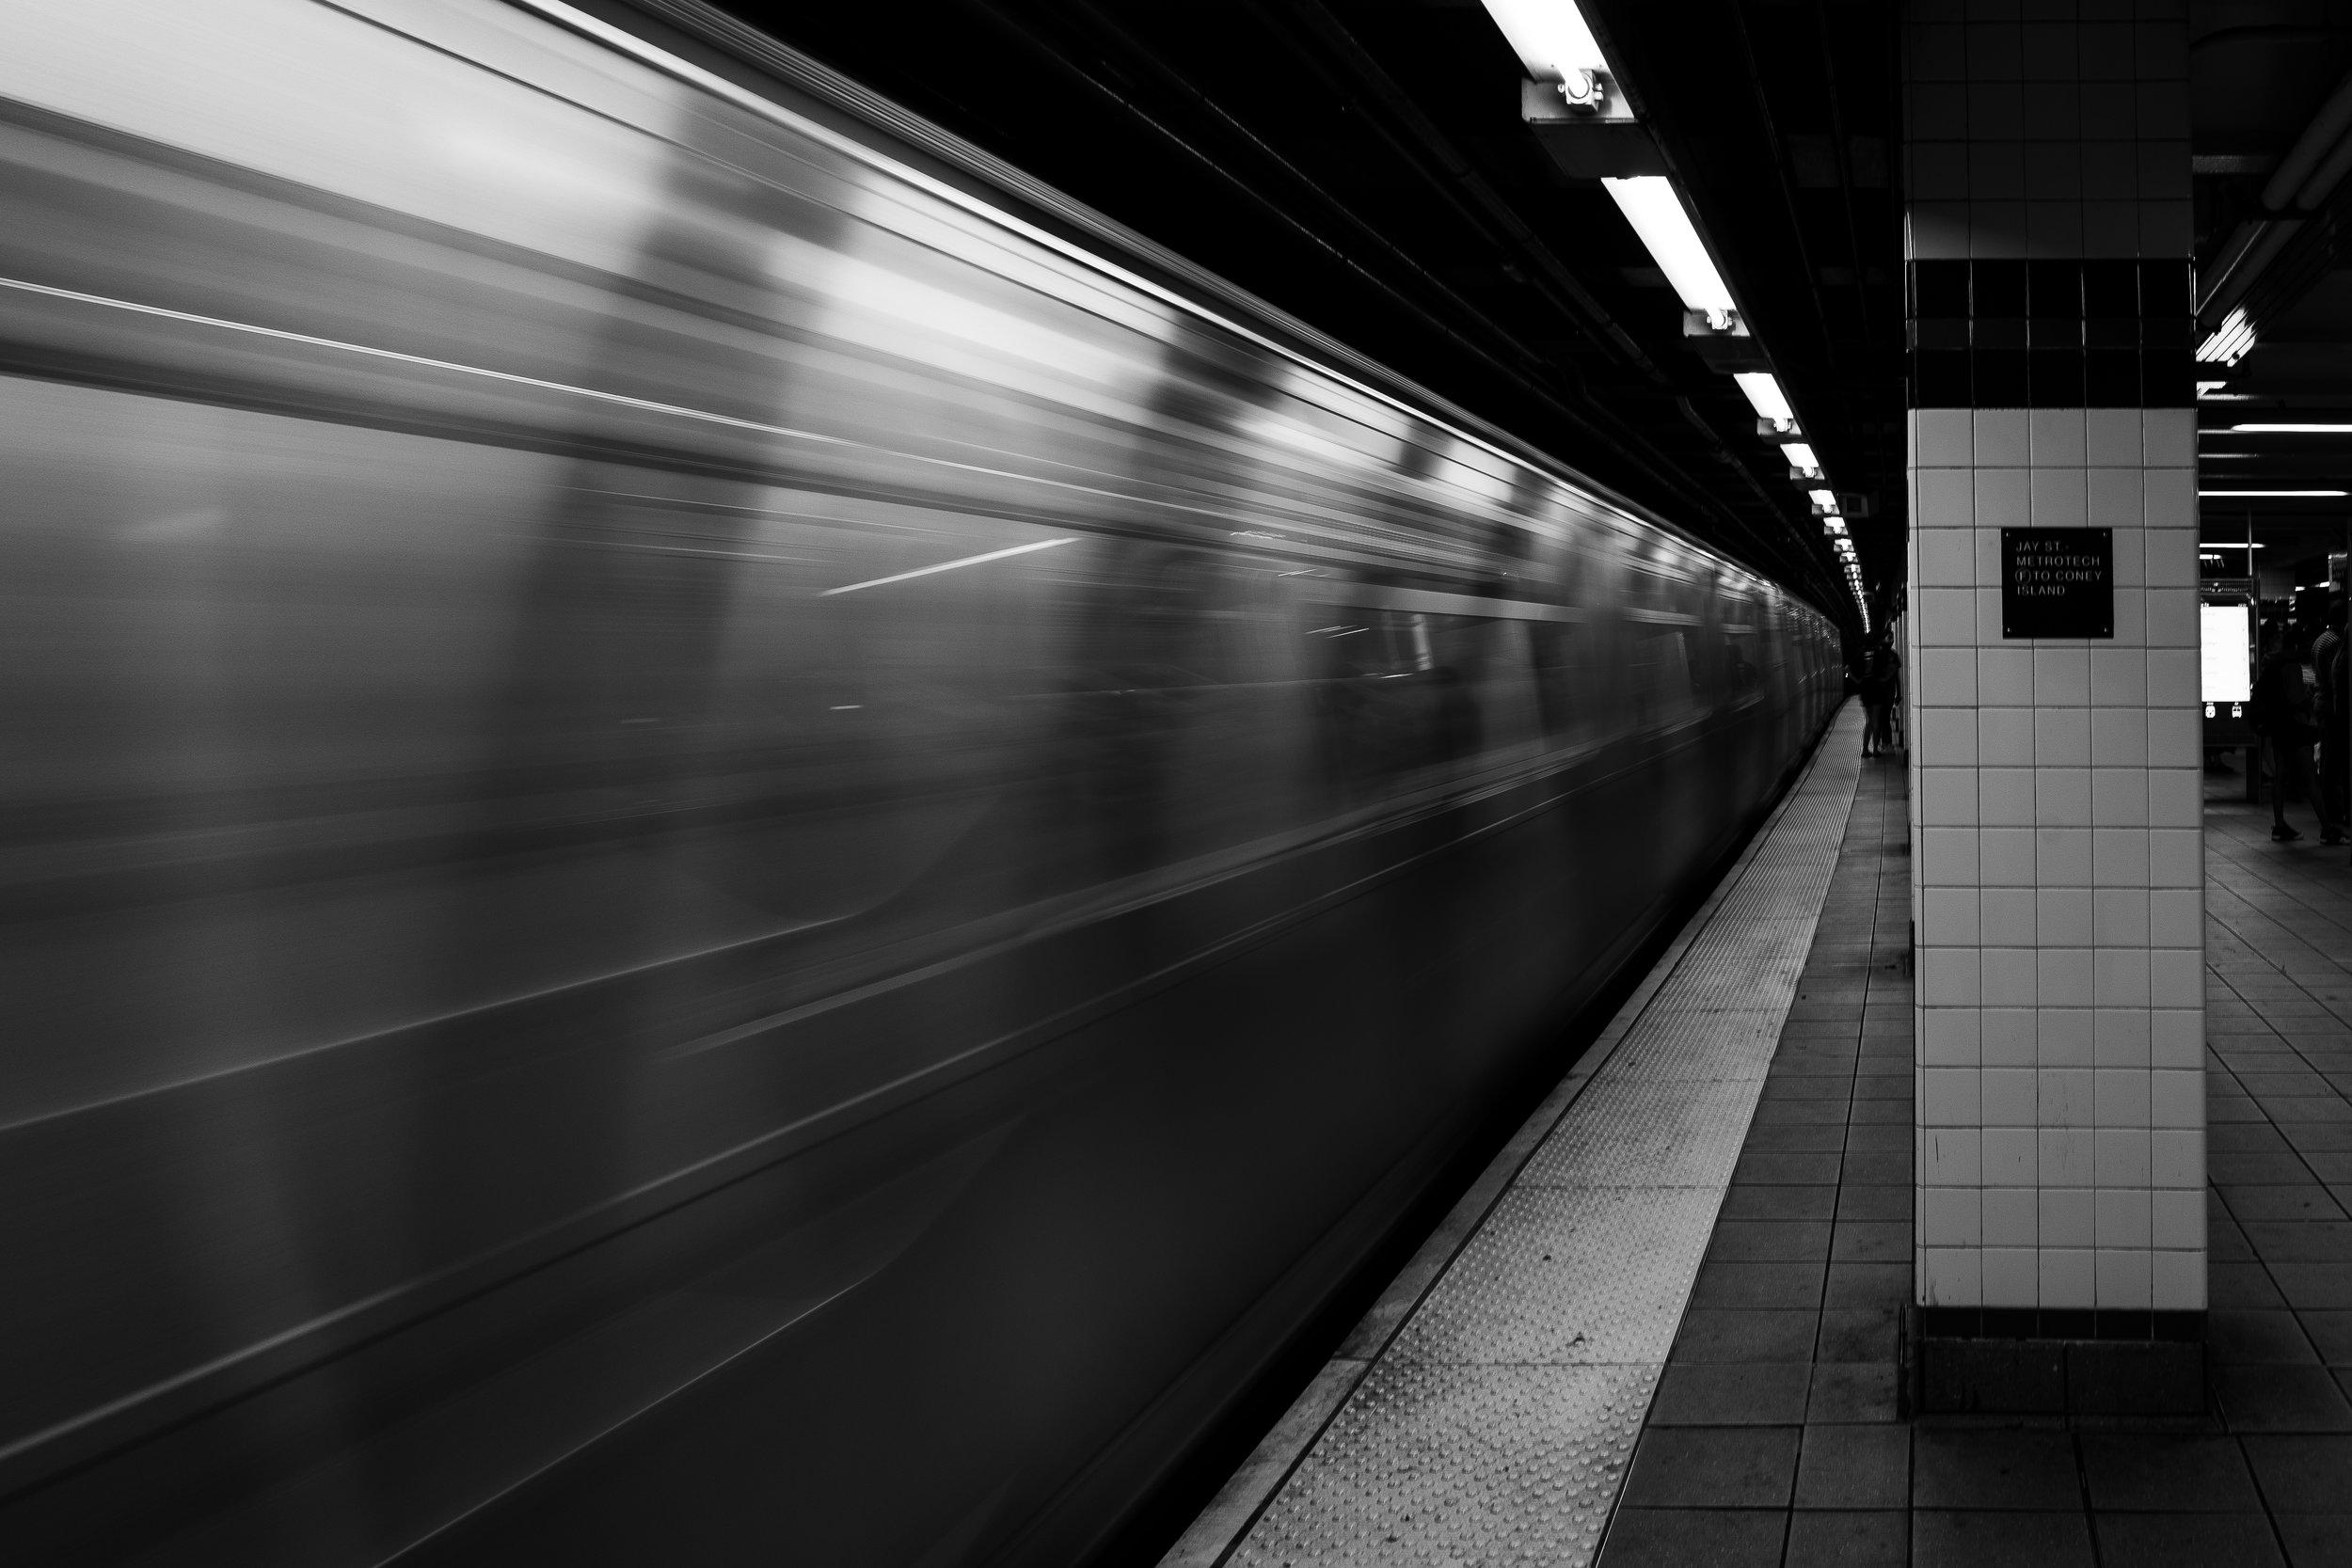 jay street subway stop.jpg